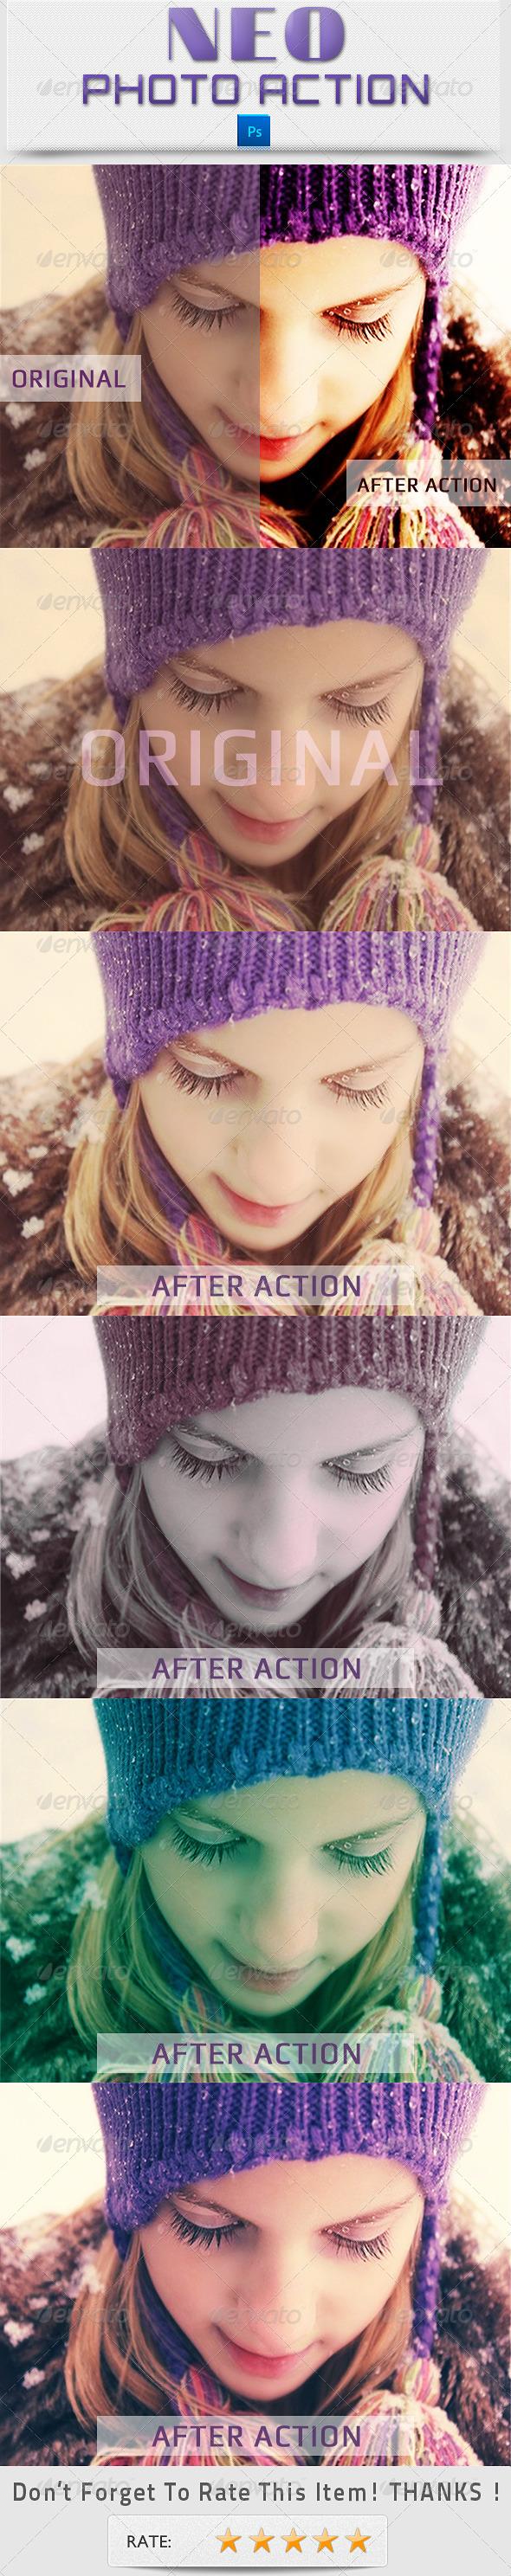 GraphicRiver Neo Photo Action 7921471